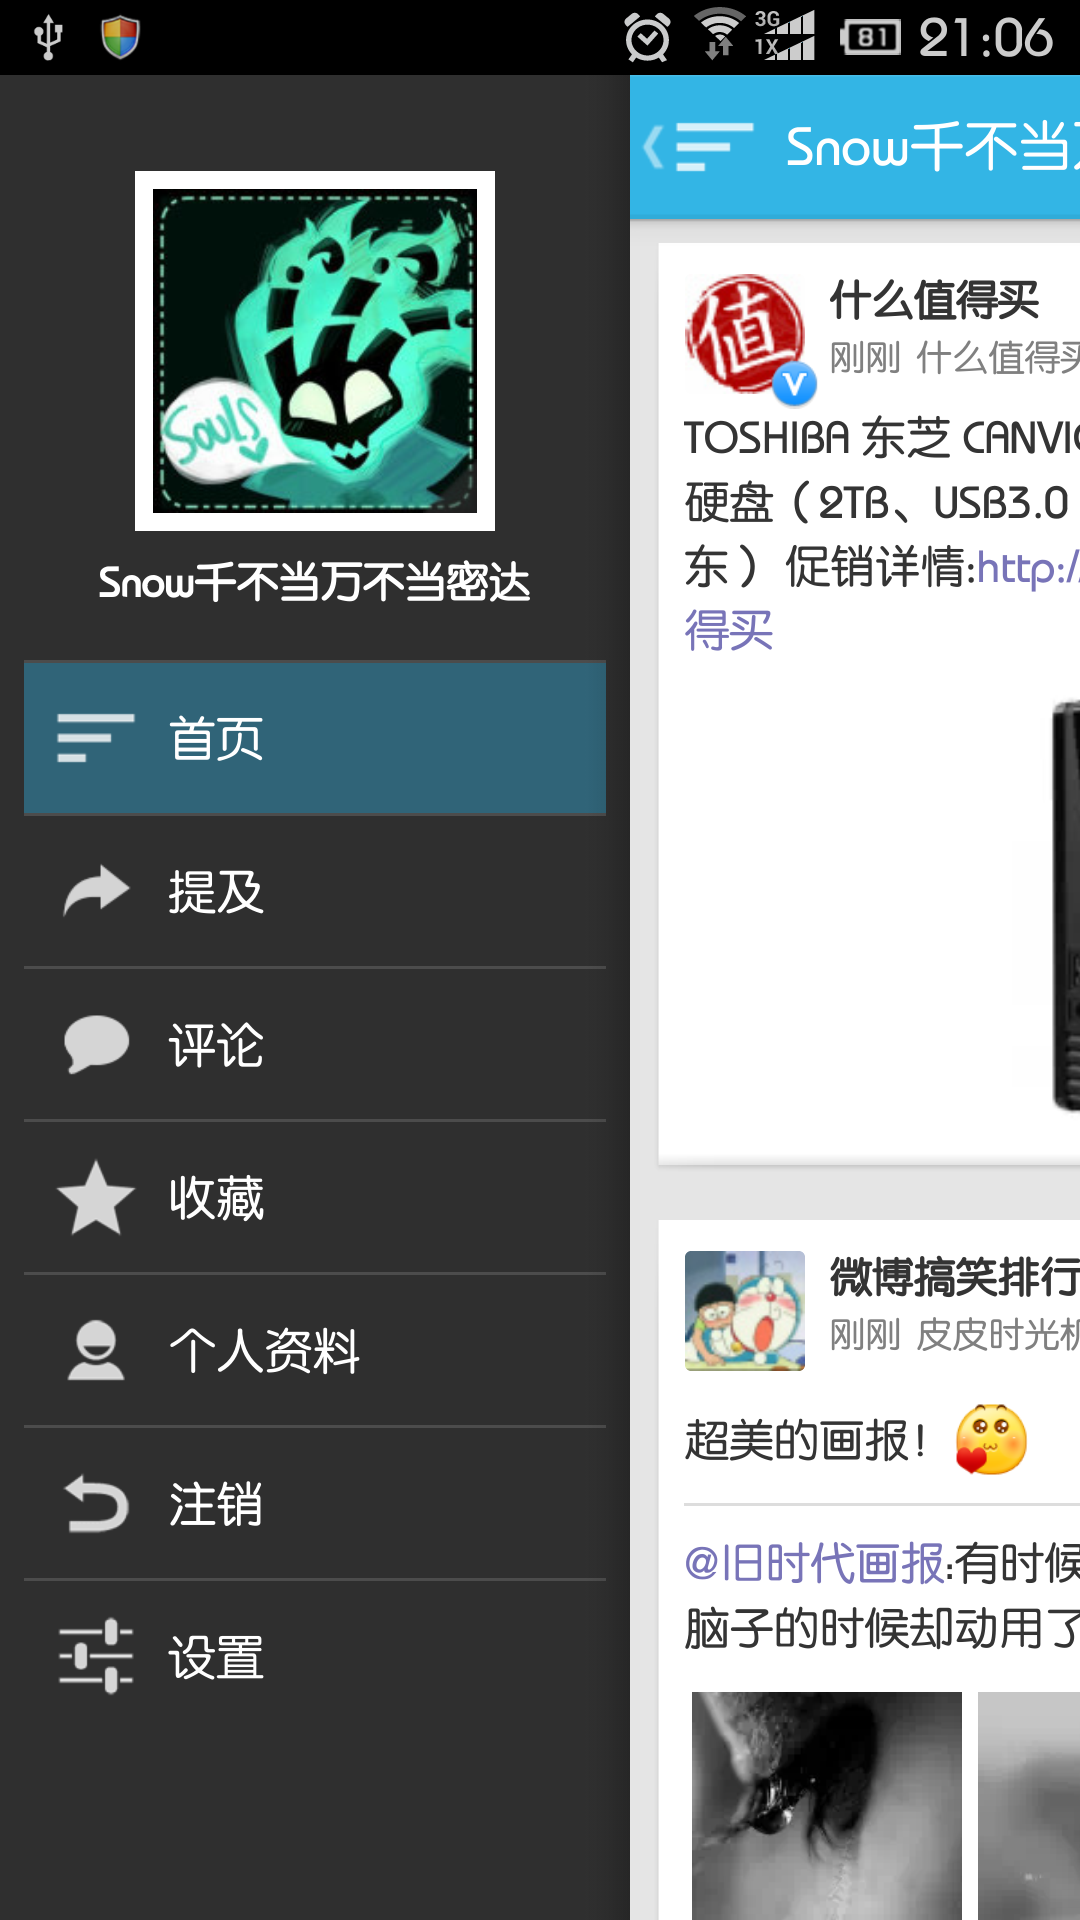 Screenshot_2013-11-05-21-06-18.png